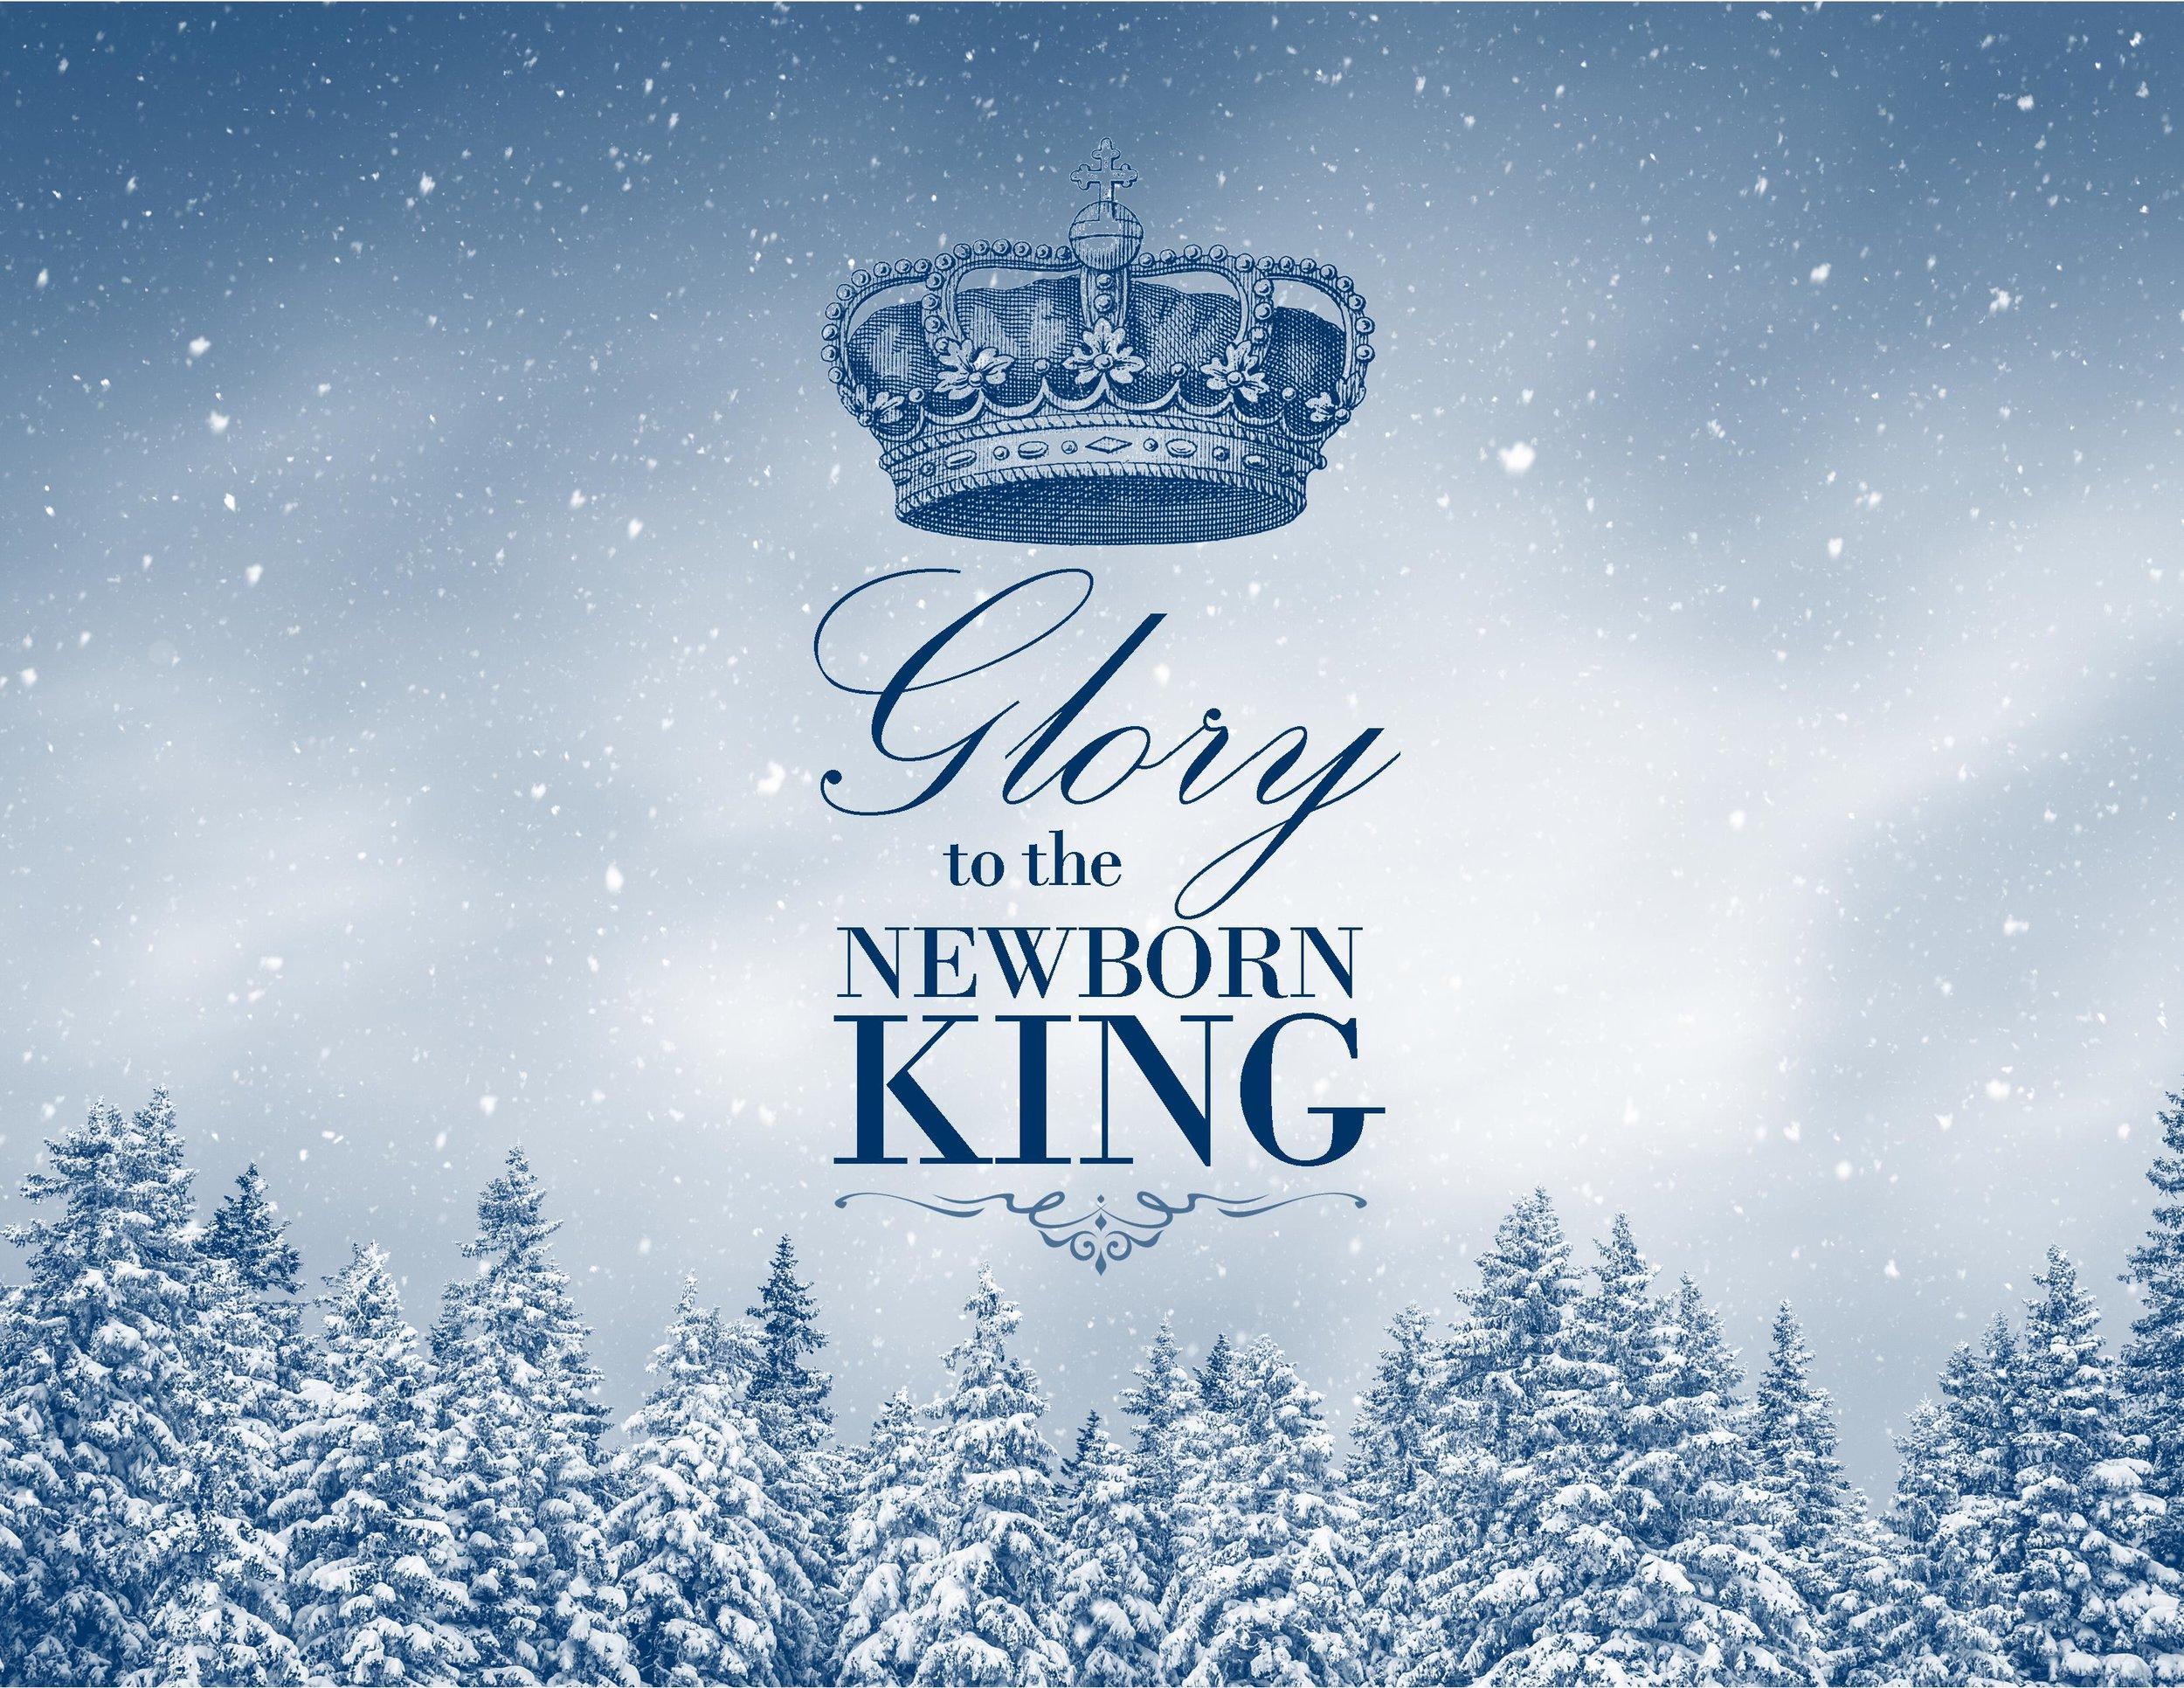 December 18, 2016 ~ Glory to the Newborn King (Matthew 1:18-25) ~ Pastor Jason Pilchard